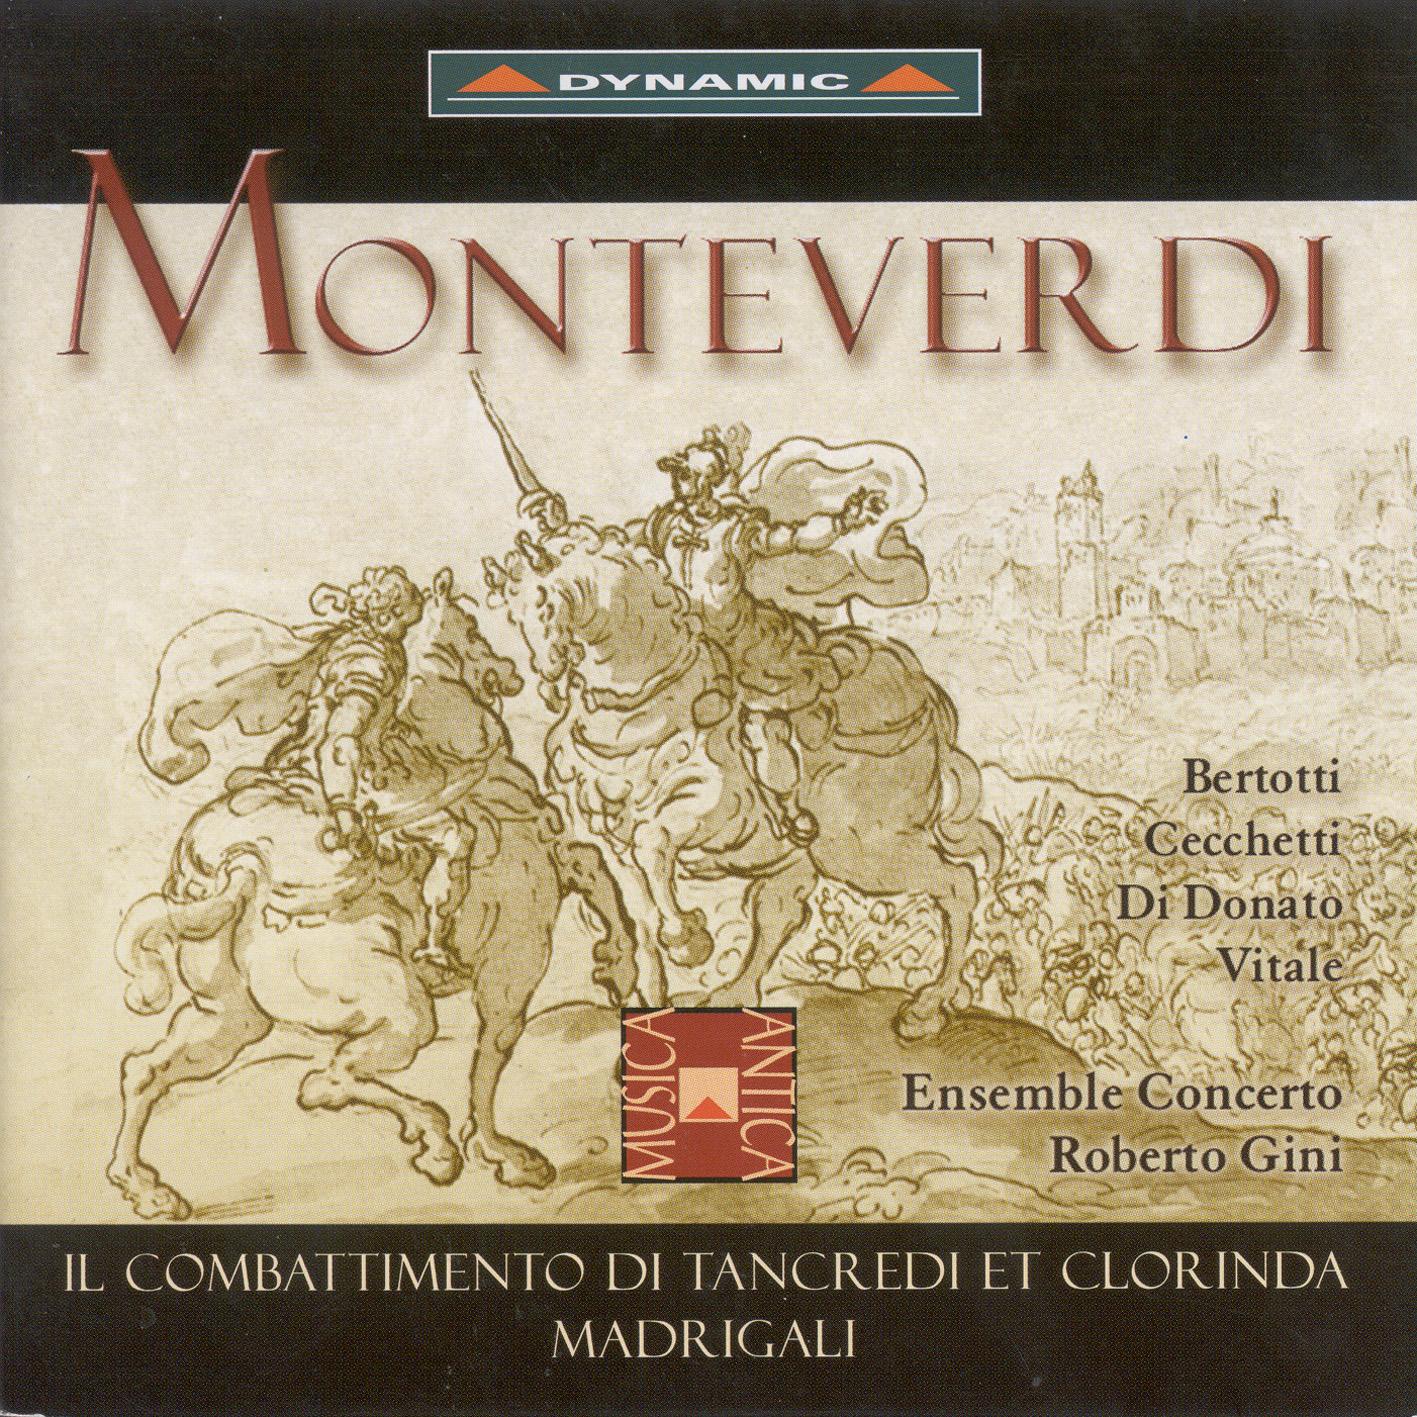 Monteverdi: Combattimento Di Tancredi Et Clorinda (Il) - Madrigals - Millioni: Ballo Del Monteverdi (Arr. for Chamber Ensemble)